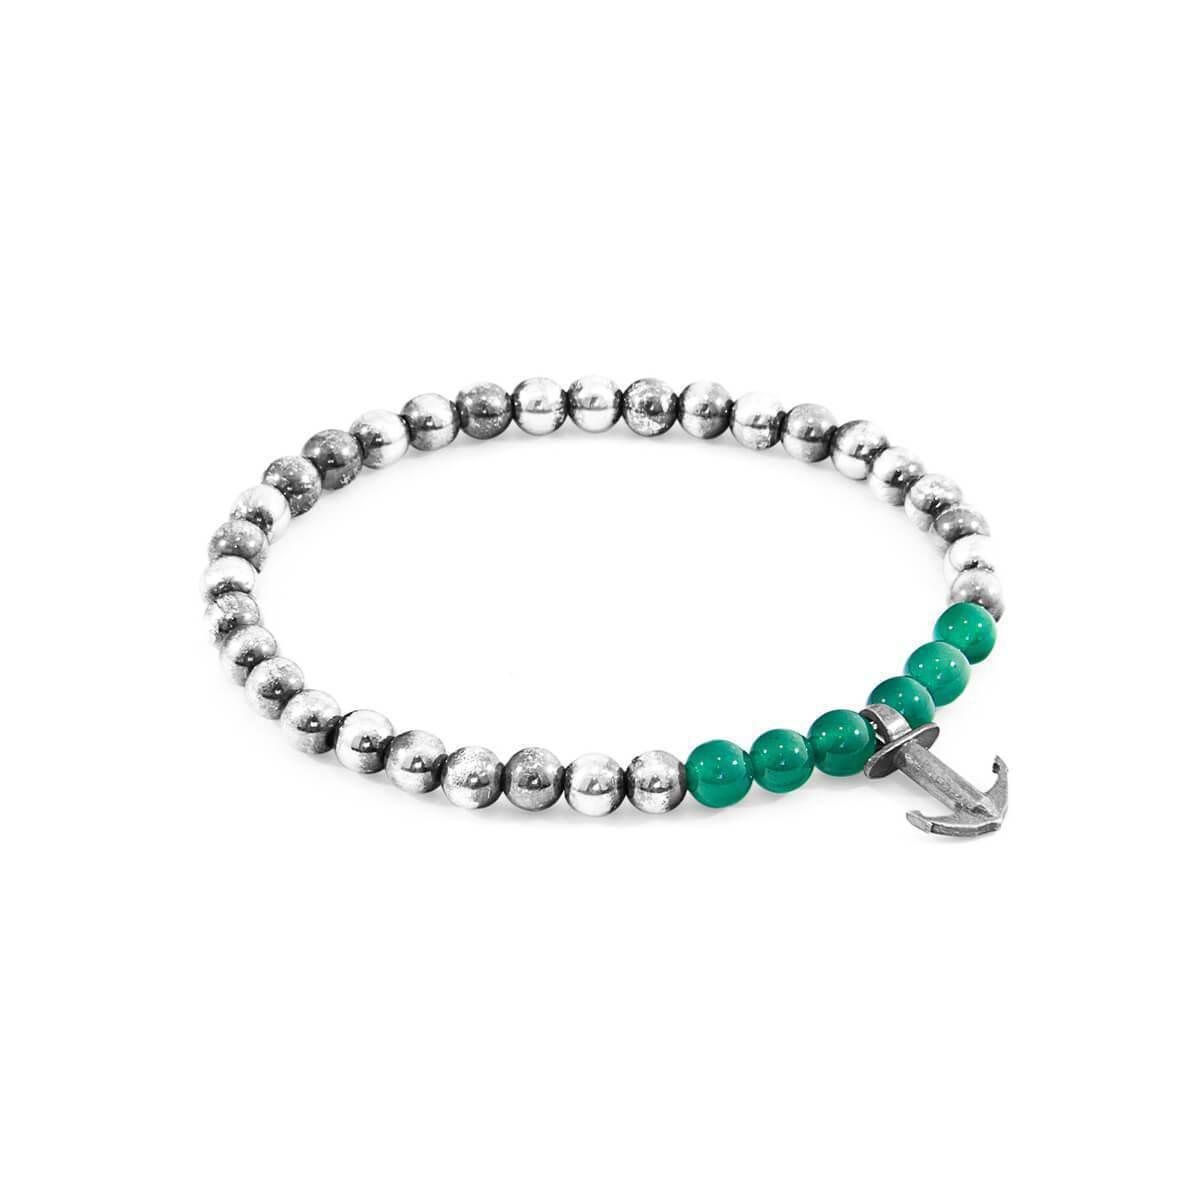 Anchor & Crew Black Onyx Keel Silver And Stone Bracelet - 19cm (most popular) z8nKhuJ2d2